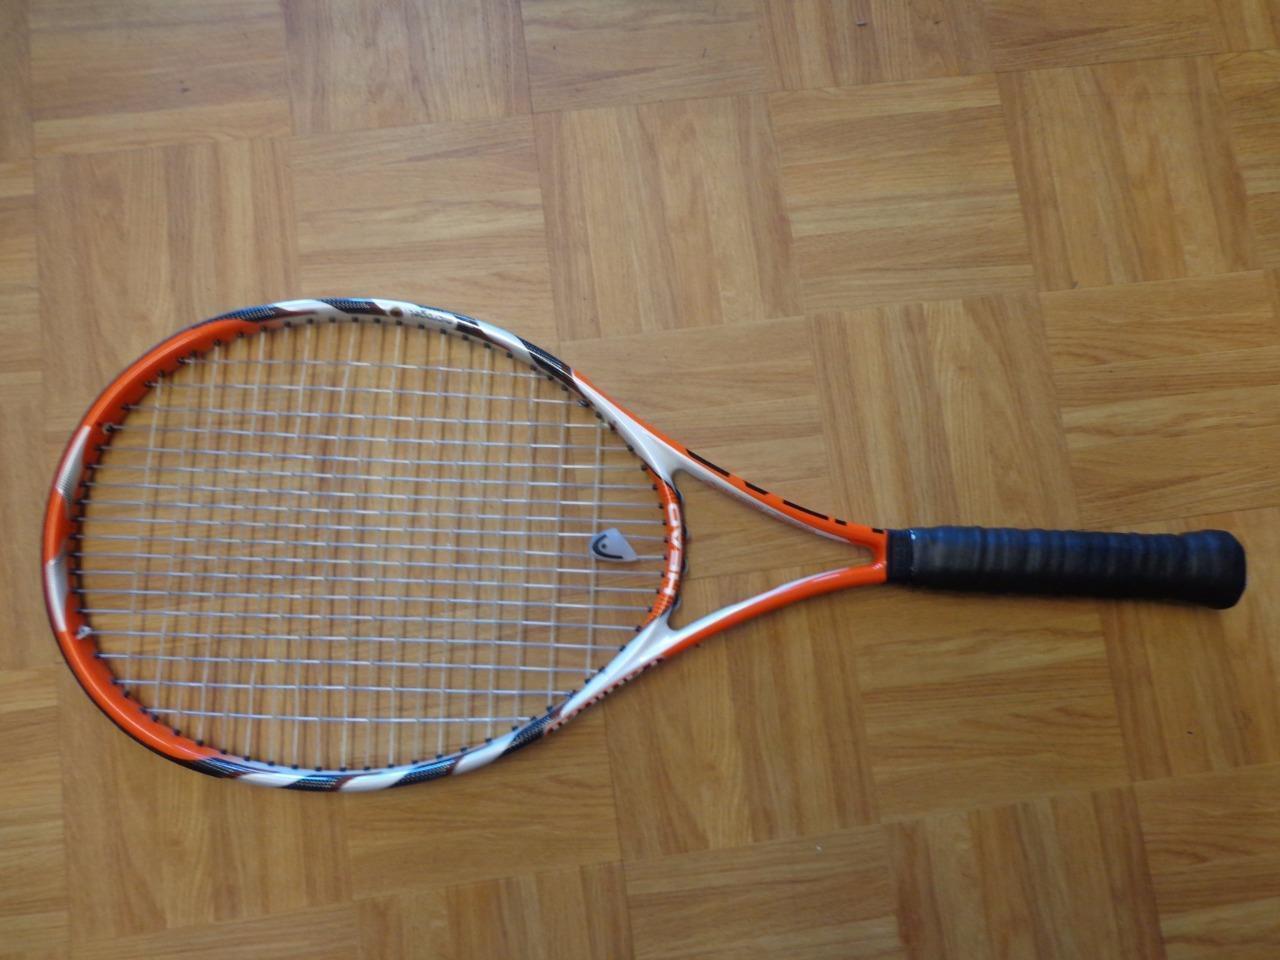 Head Microgel Radical OverTaille 107 Head 4 1 2 grip raquette de tennis